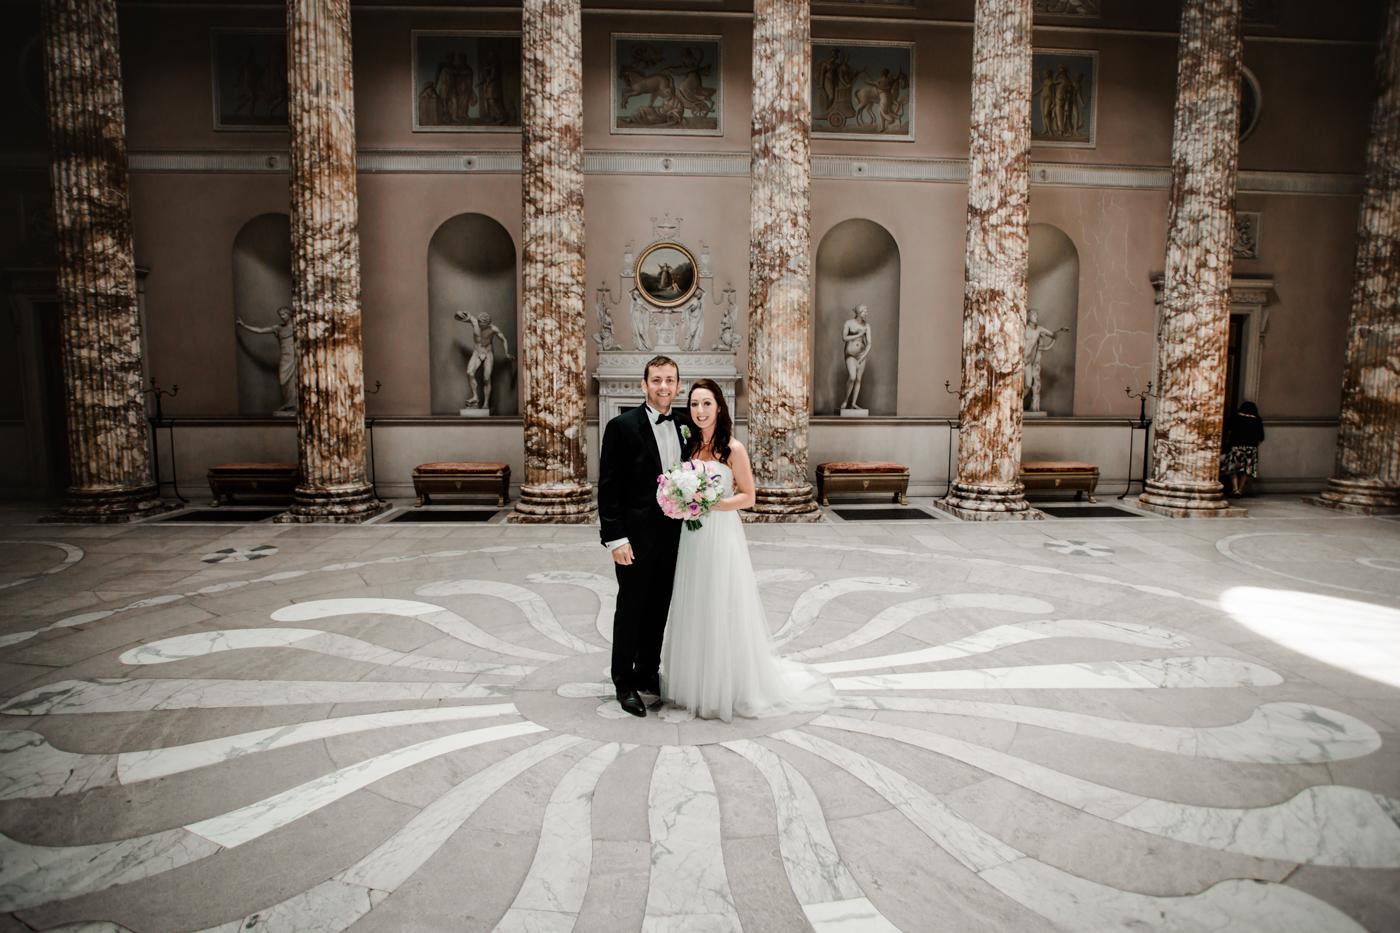 077 - Abi and Chris at Kedleston Hall - Wedding Photography by Mark Pugh www.markpugh.com - 0238.JPG